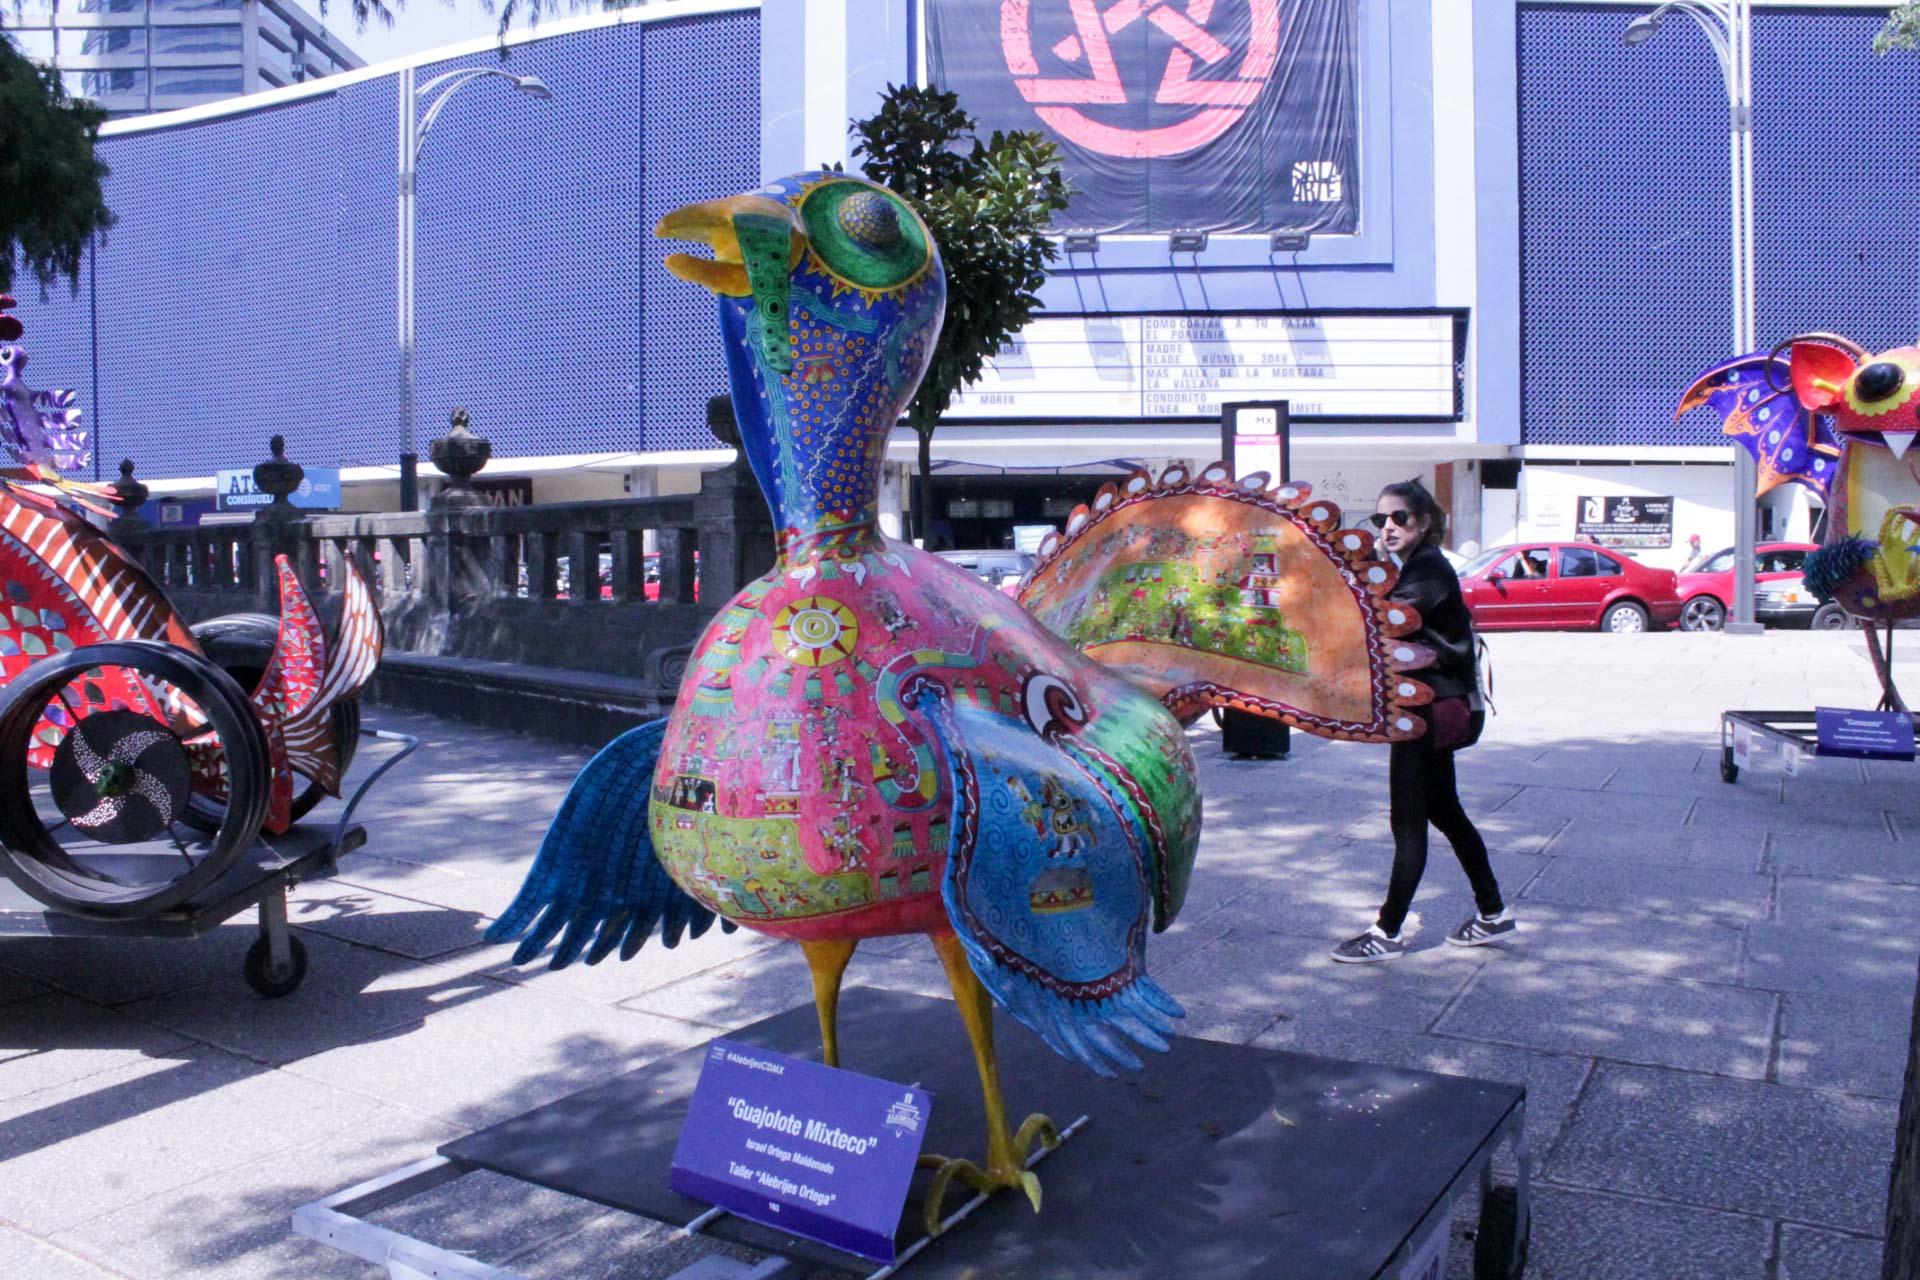 mexico-city-10-2017-6.jpg